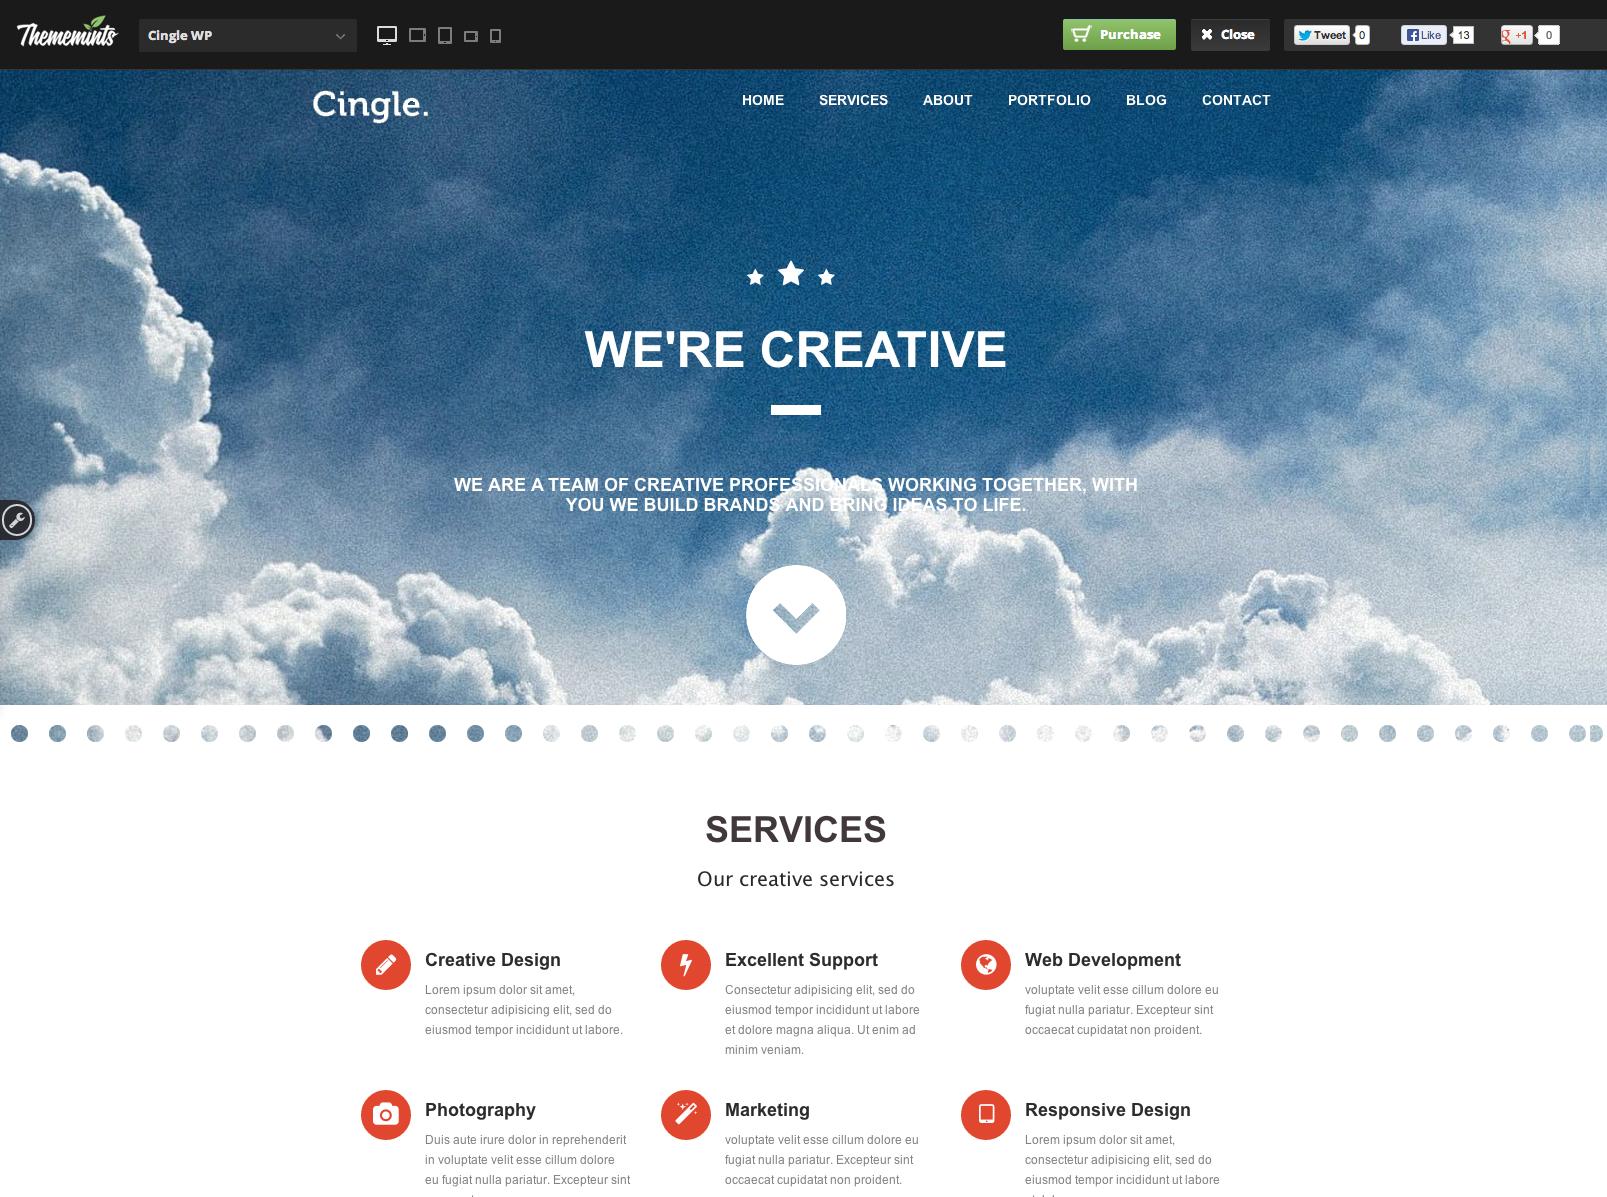 Website Homepage Layout Web Design Modern Web Layout Design Photography Marketing Layout Design Inspiration